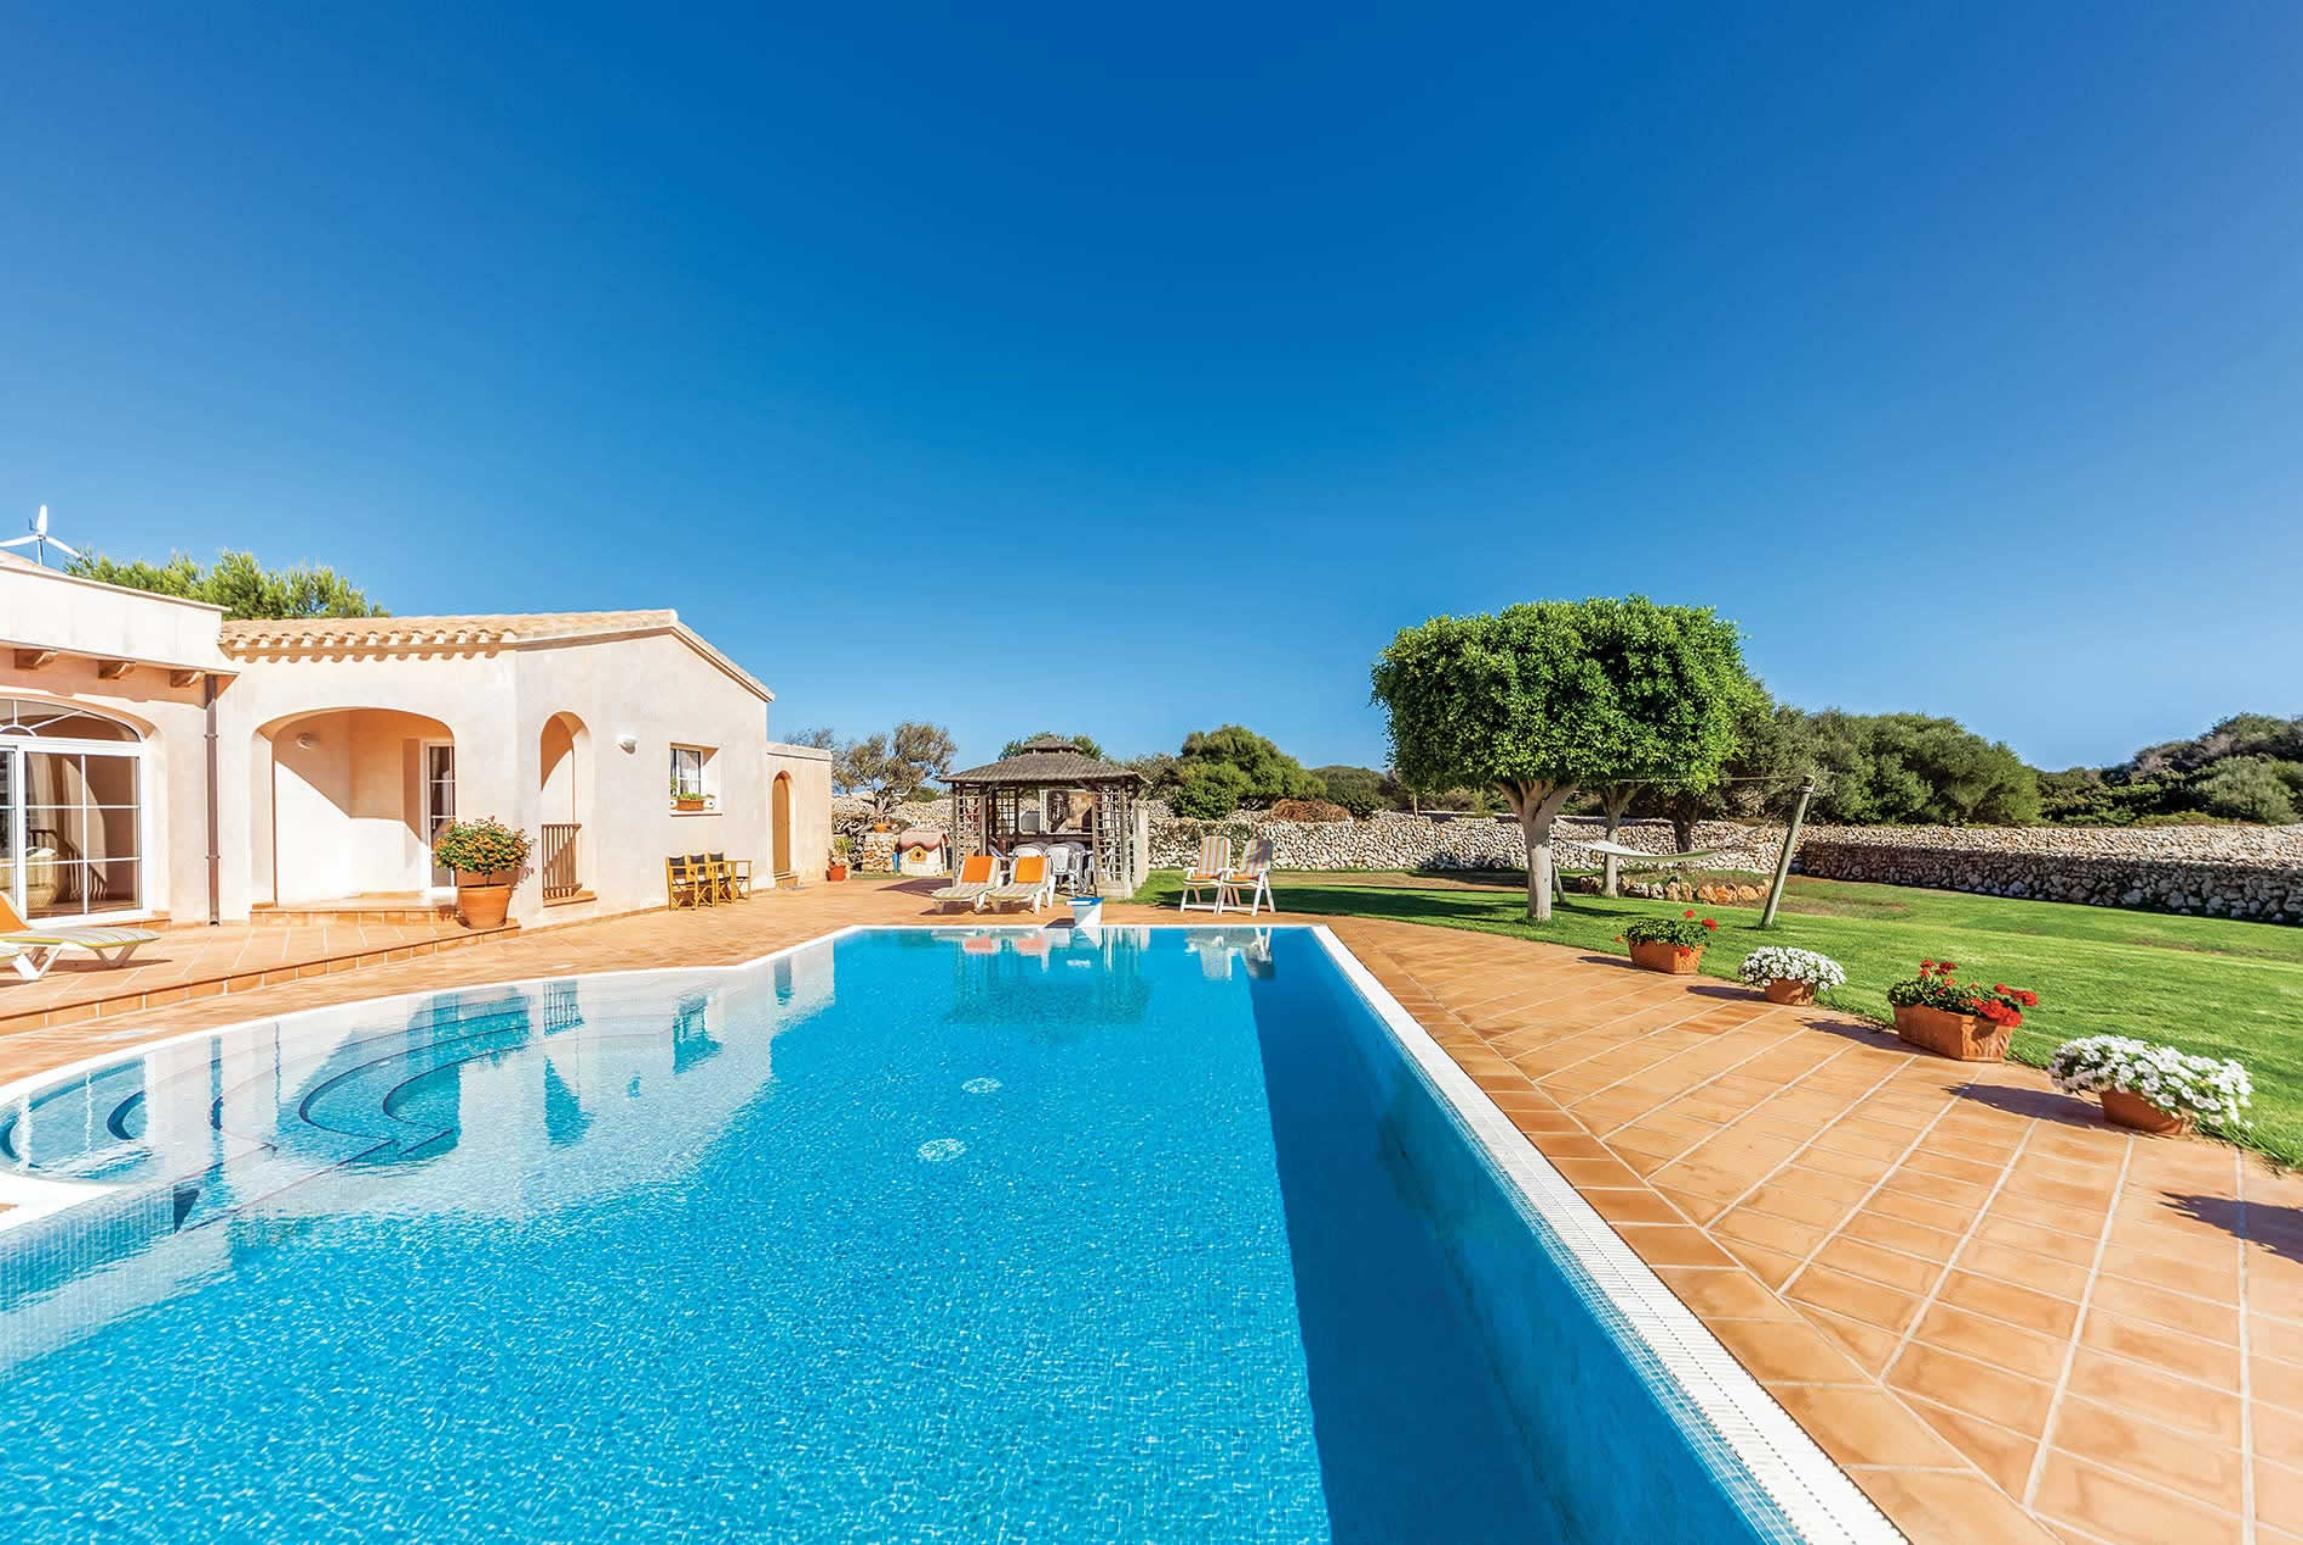 Ferienhaus Villa Estrellita (2649653), Punta Prima, Menorca, Balearische Inseln, Spanien, Bild 13